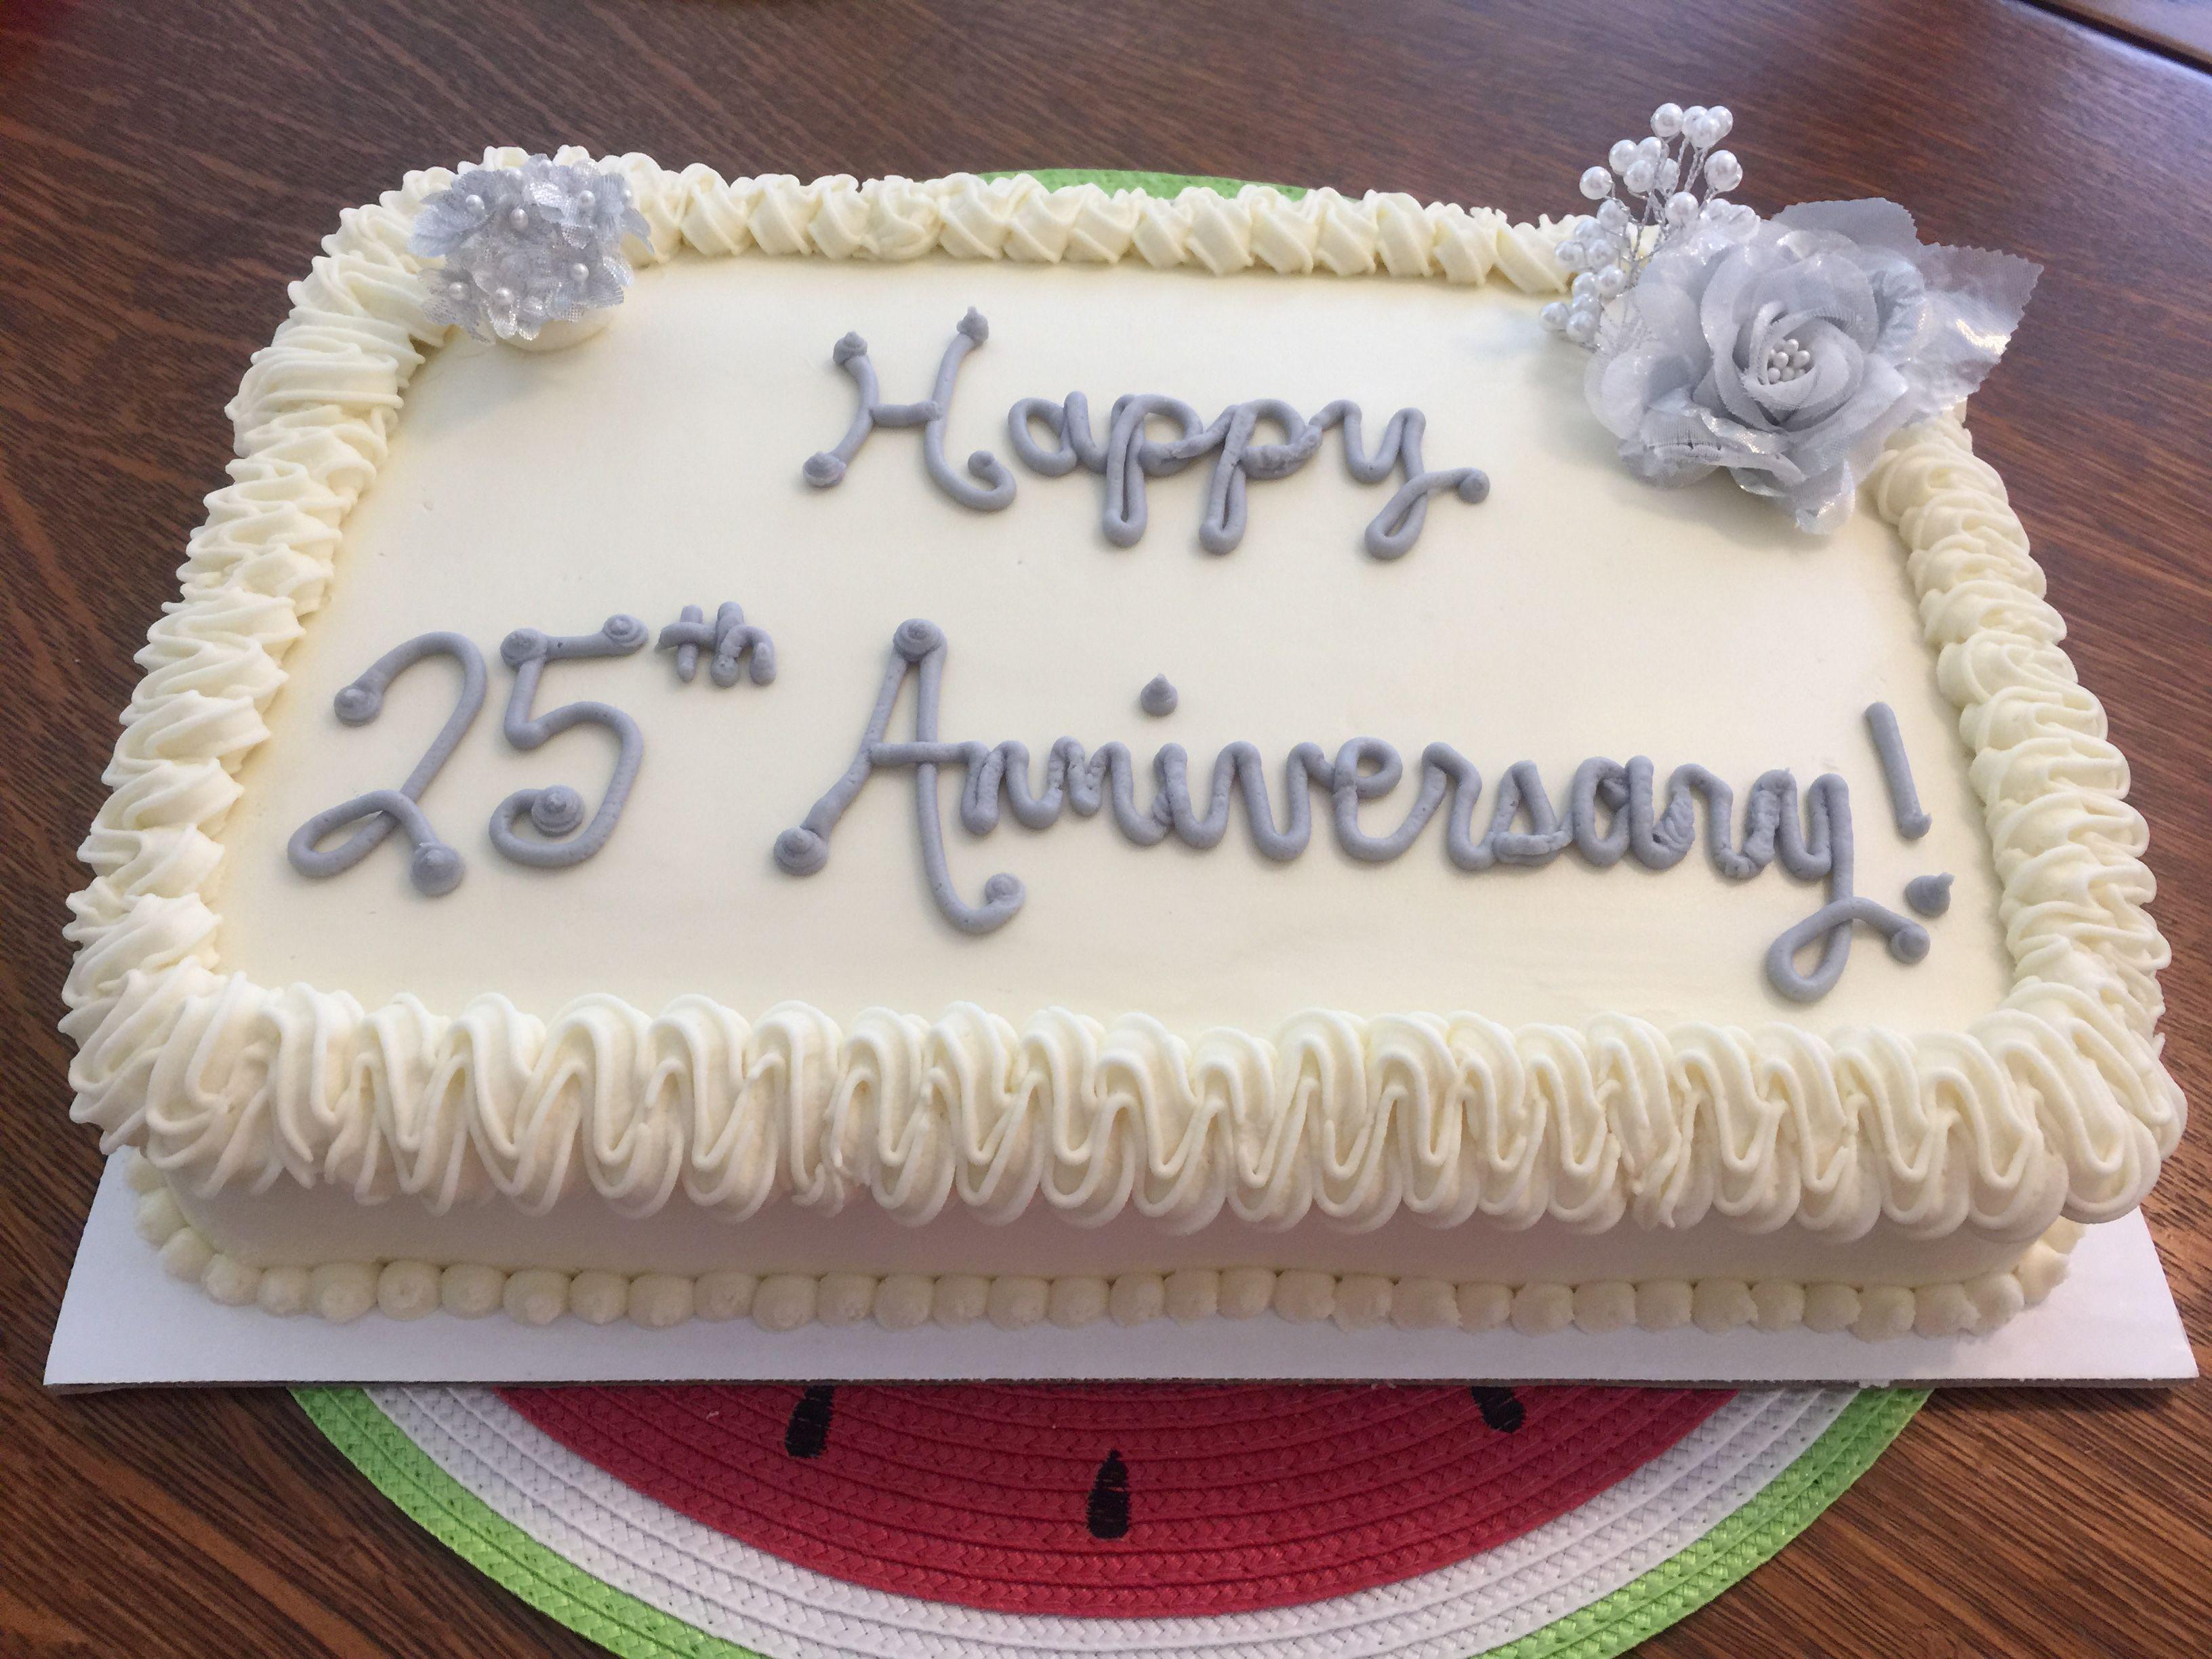 Happy 25th Anniversary 1 4 Sheet Chocolate Cake With Buttercream